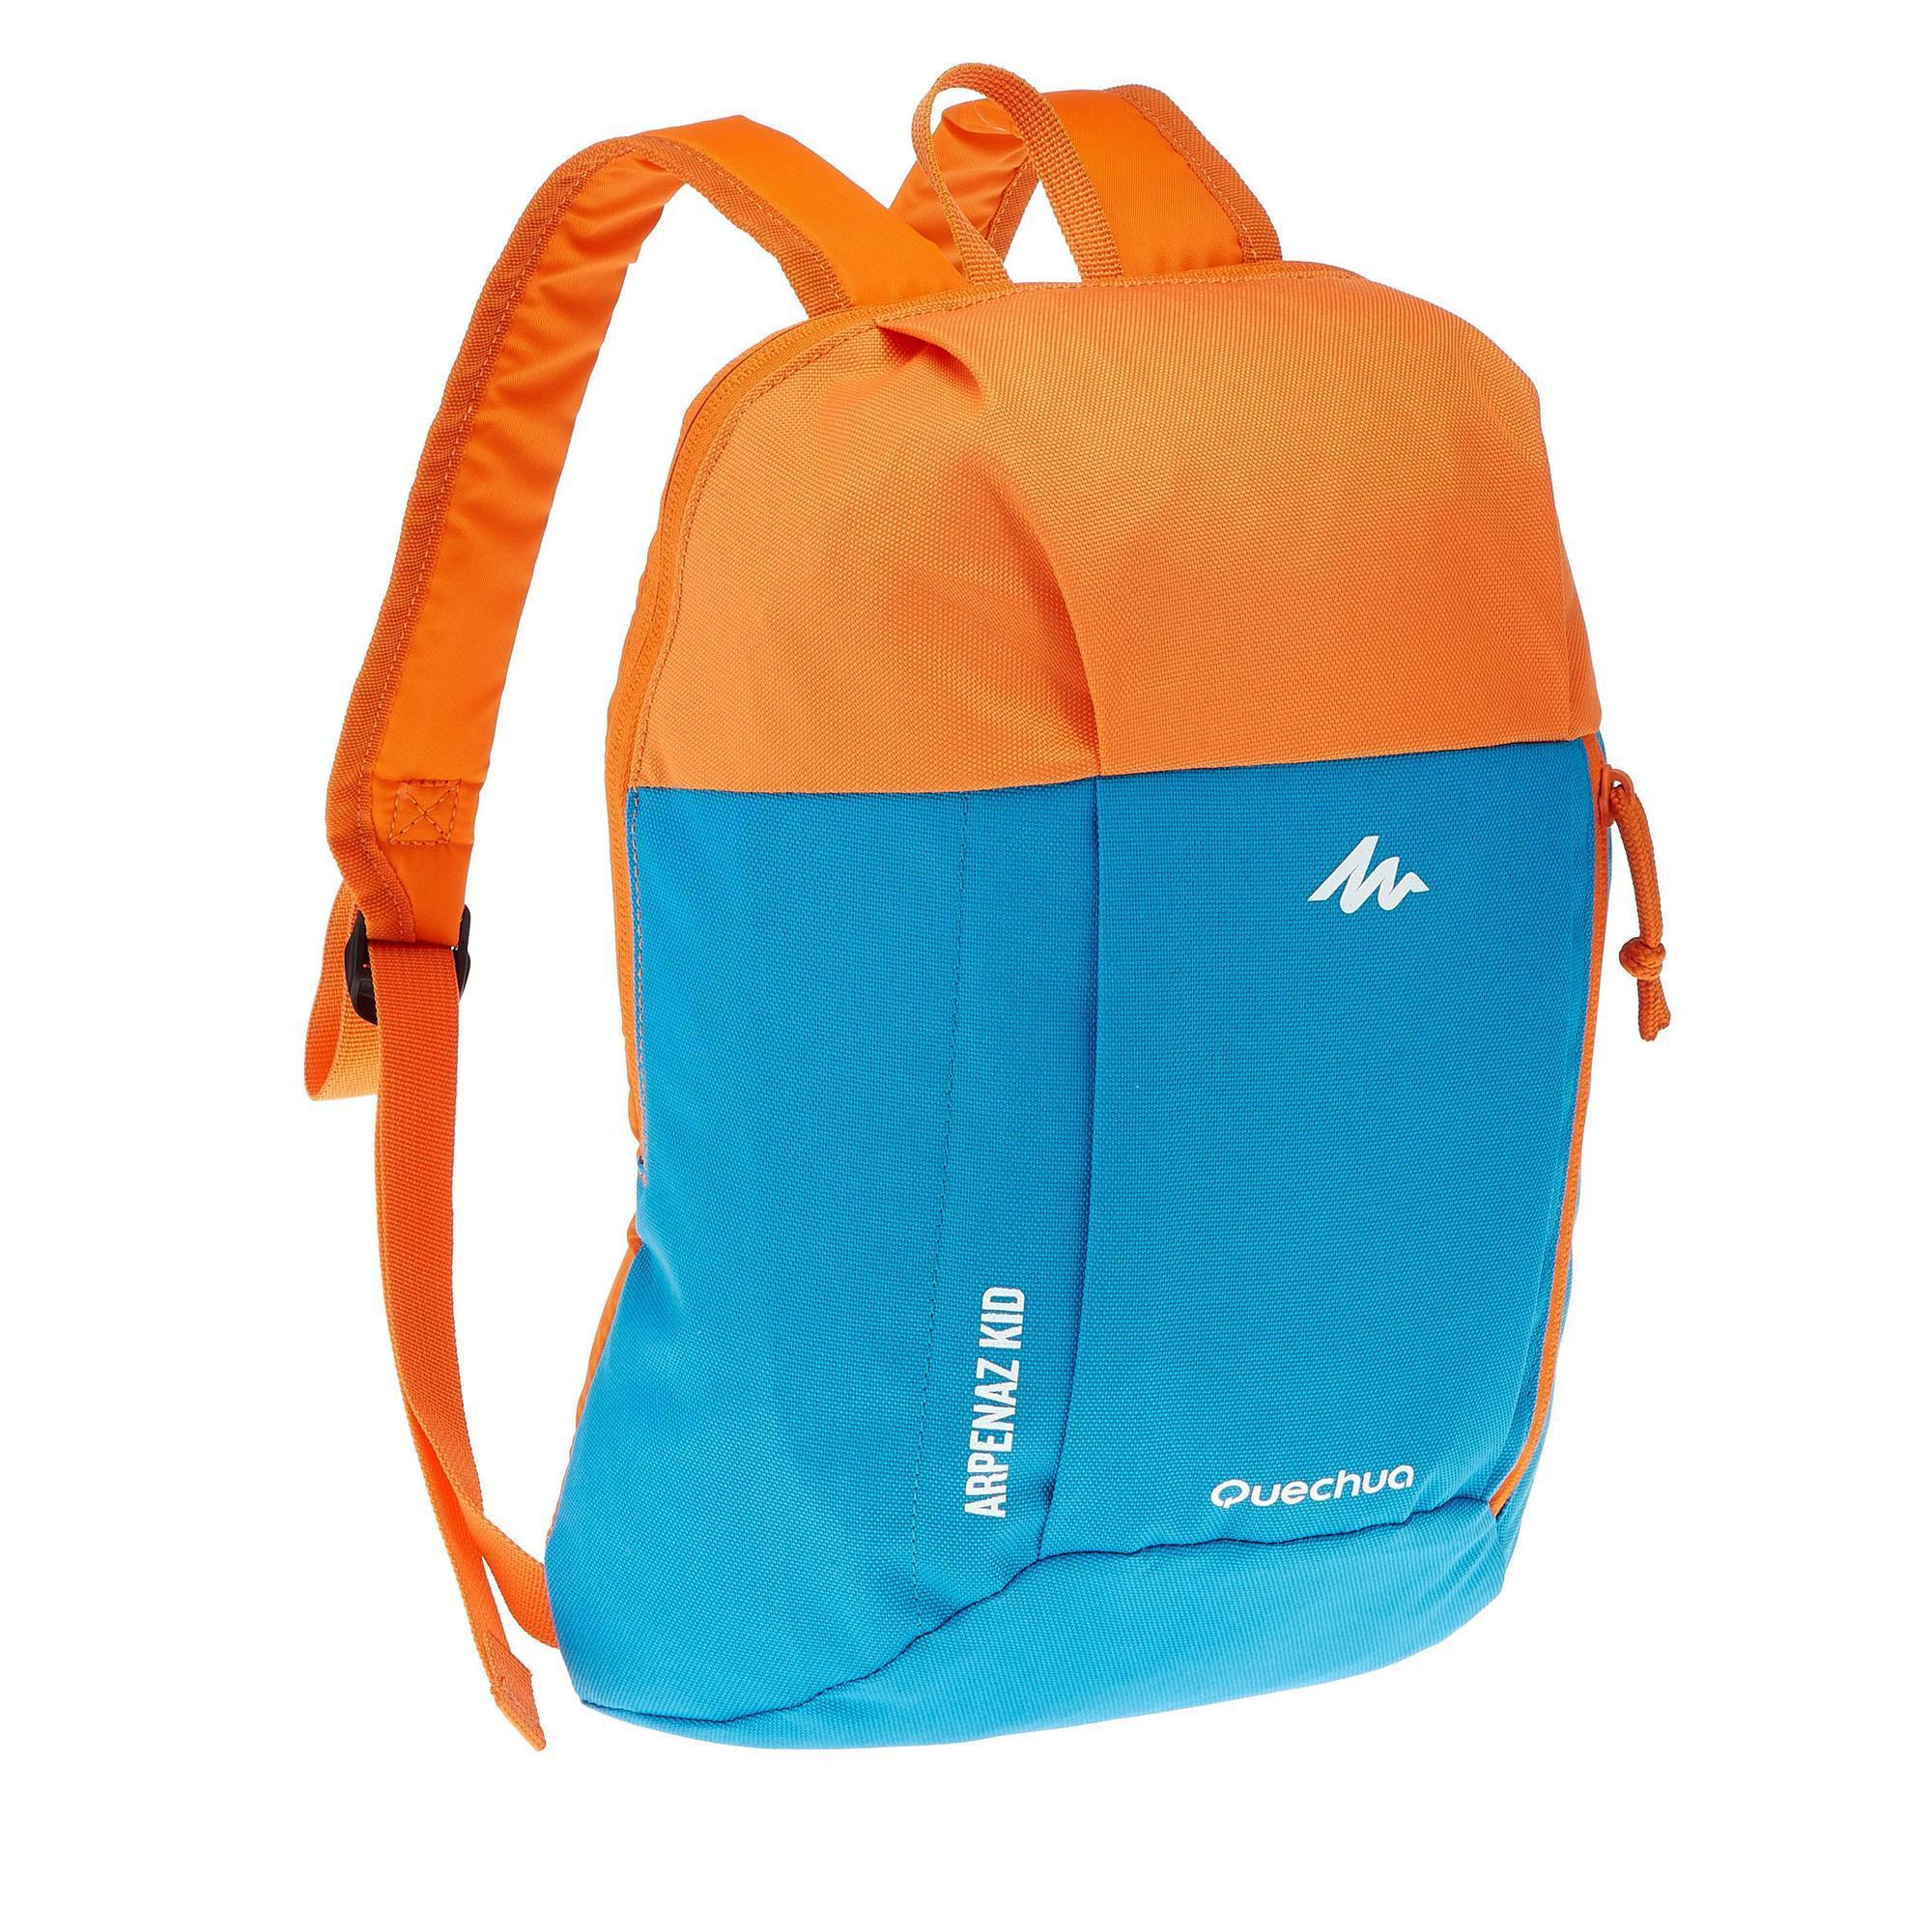 sac dos de randonn e enfant arpenaz 7 litres enfants bleu orange quechua. Black Bedroom Furniture Sets. Home Design Ideas